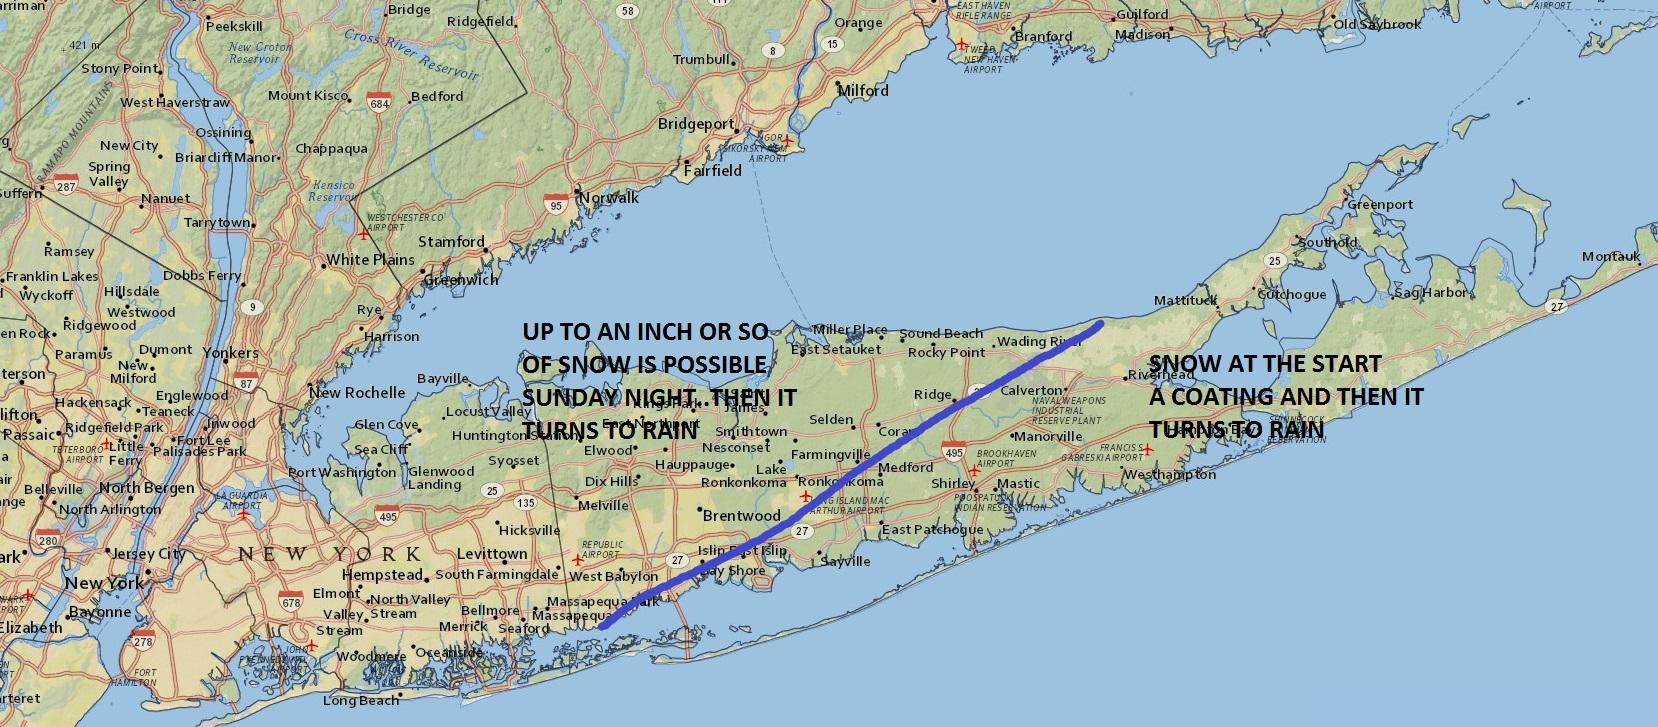 Long Island Snow Forecast Sunday Night Weather Long Island